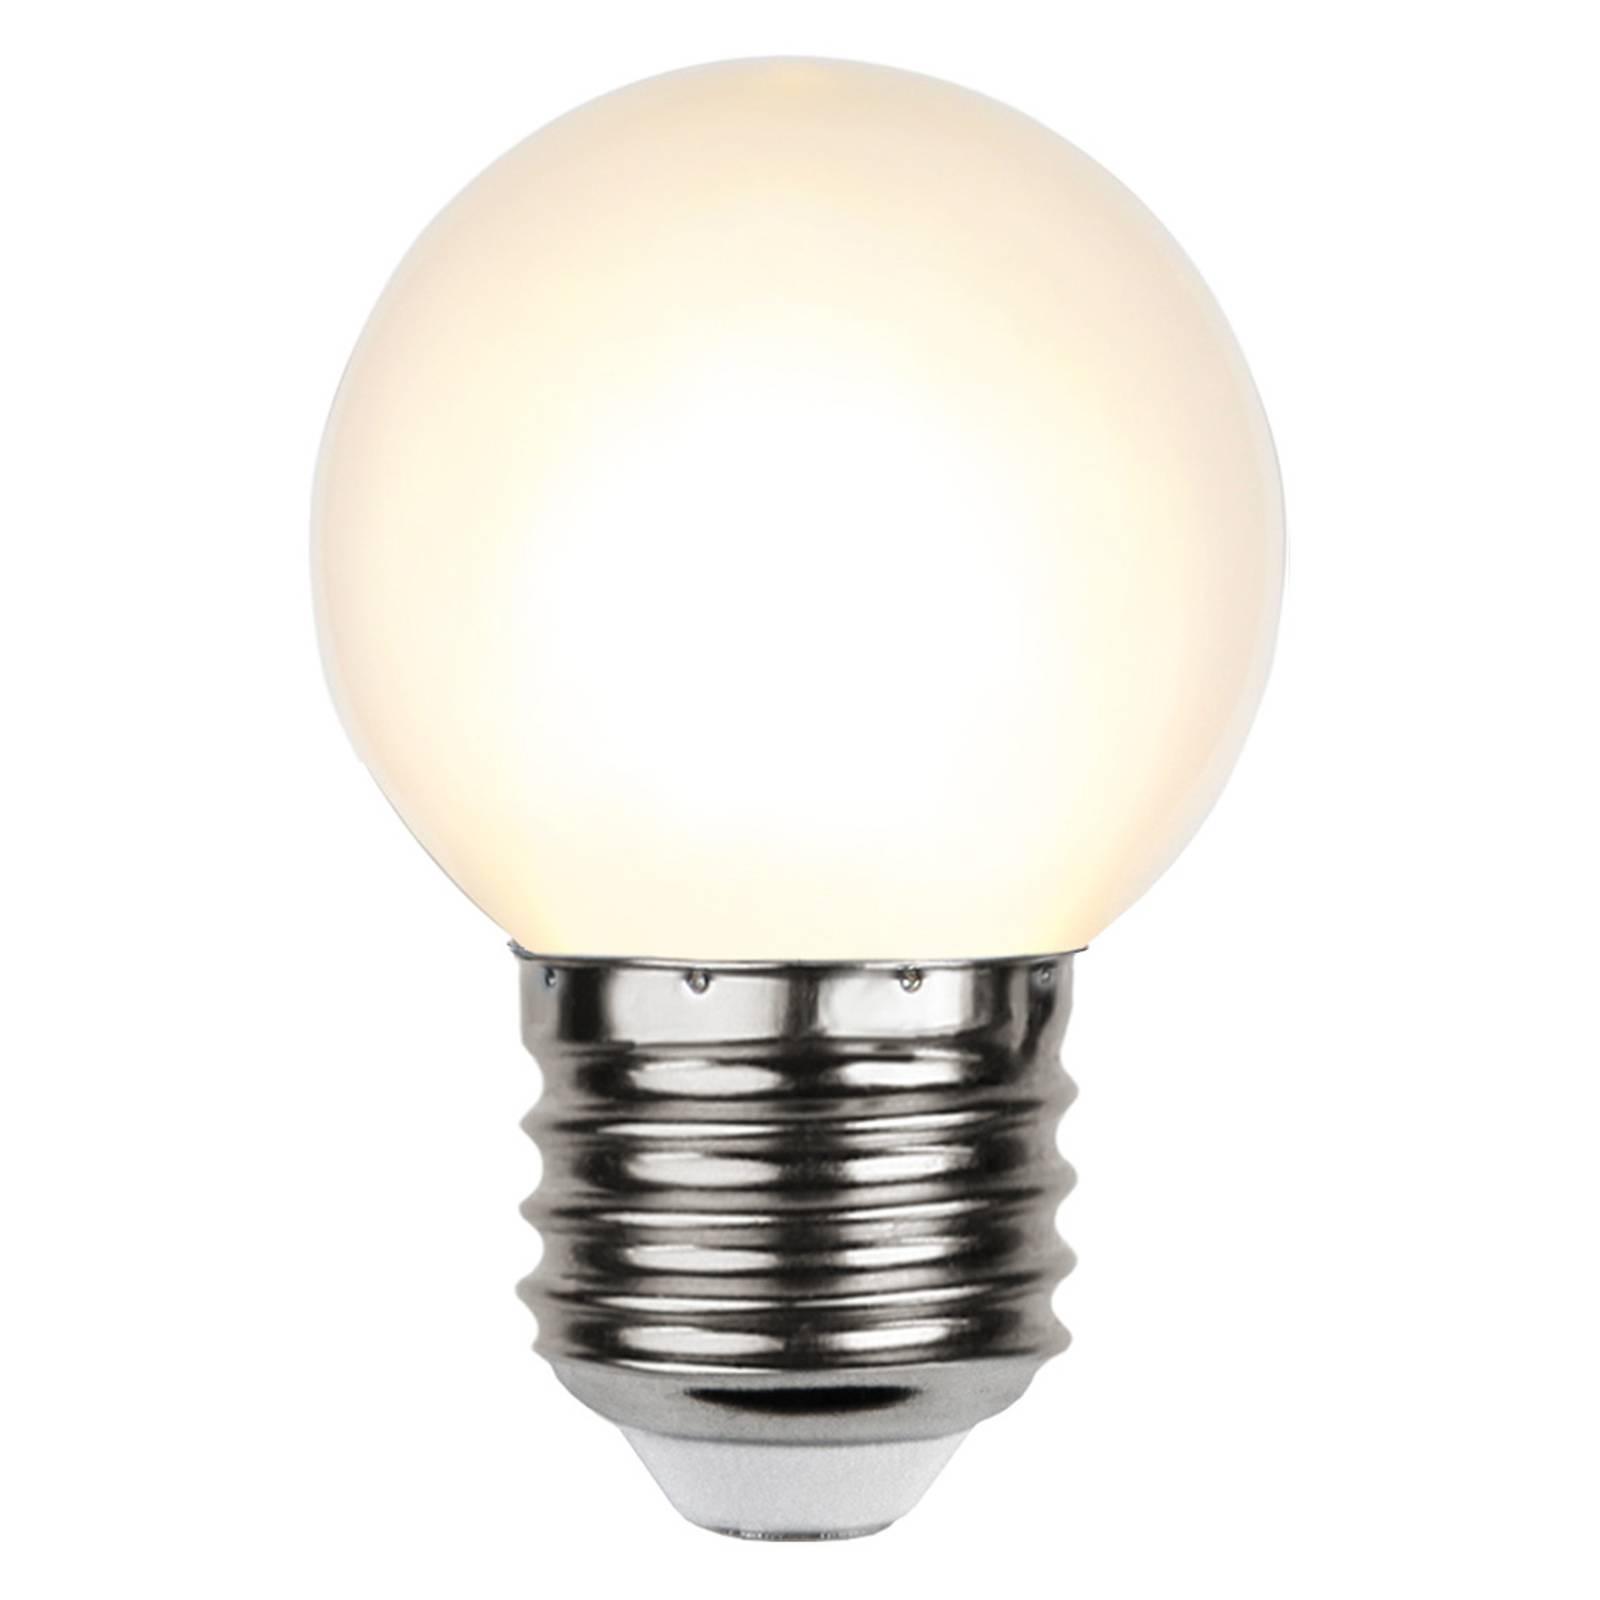 LED-lamppu E27 G45 valoketjuihin valkoinen 2 700 K